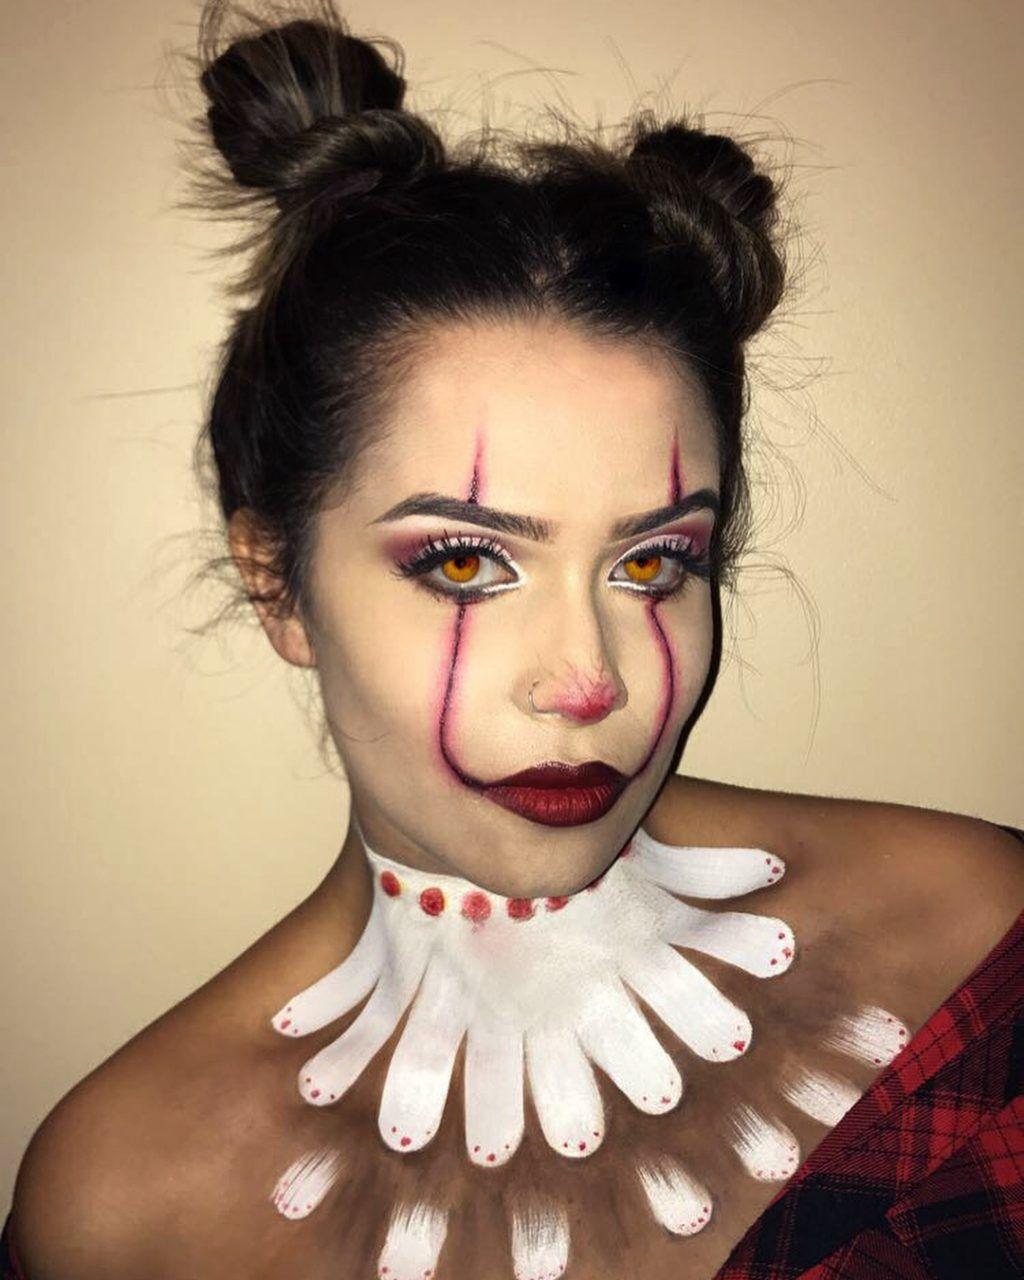 The Cutest and Creepy Halloween Makeup Ideas